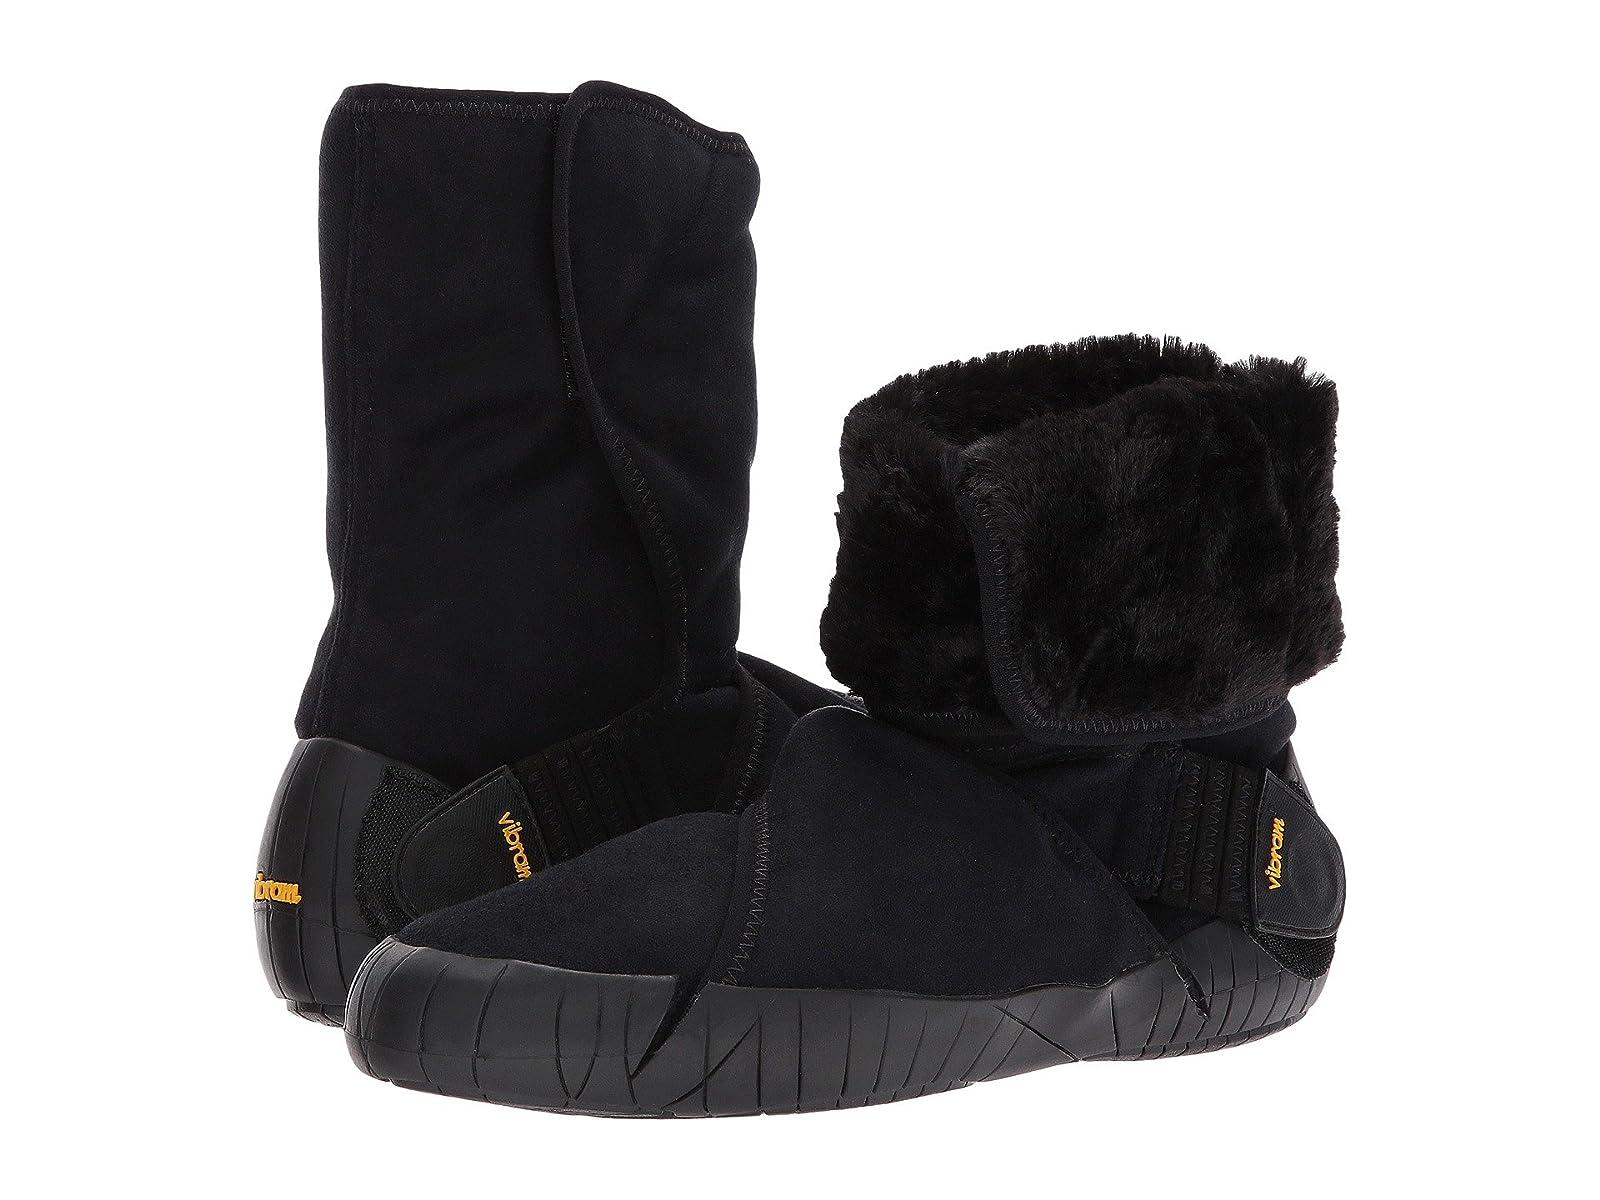 Vibram FiveFingers Furoshiki Eastern Traveler MidEconomical and quality shoes